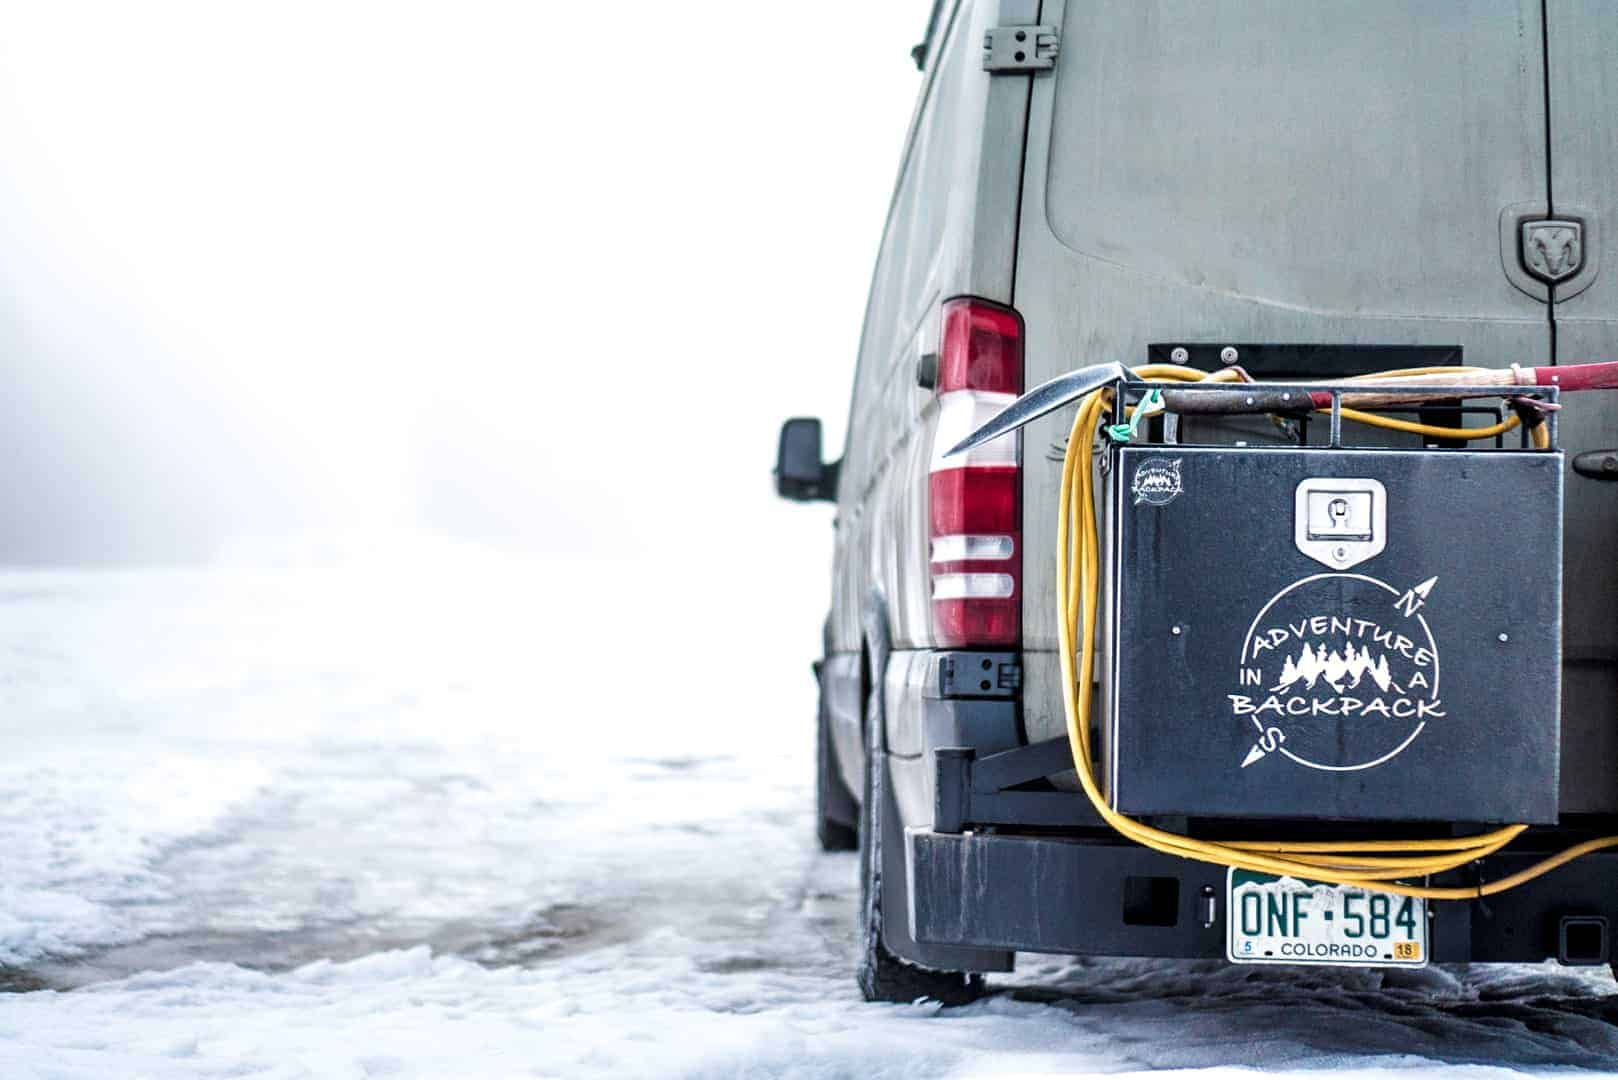 Winter Van Life is More than Skiing Powder-1-1